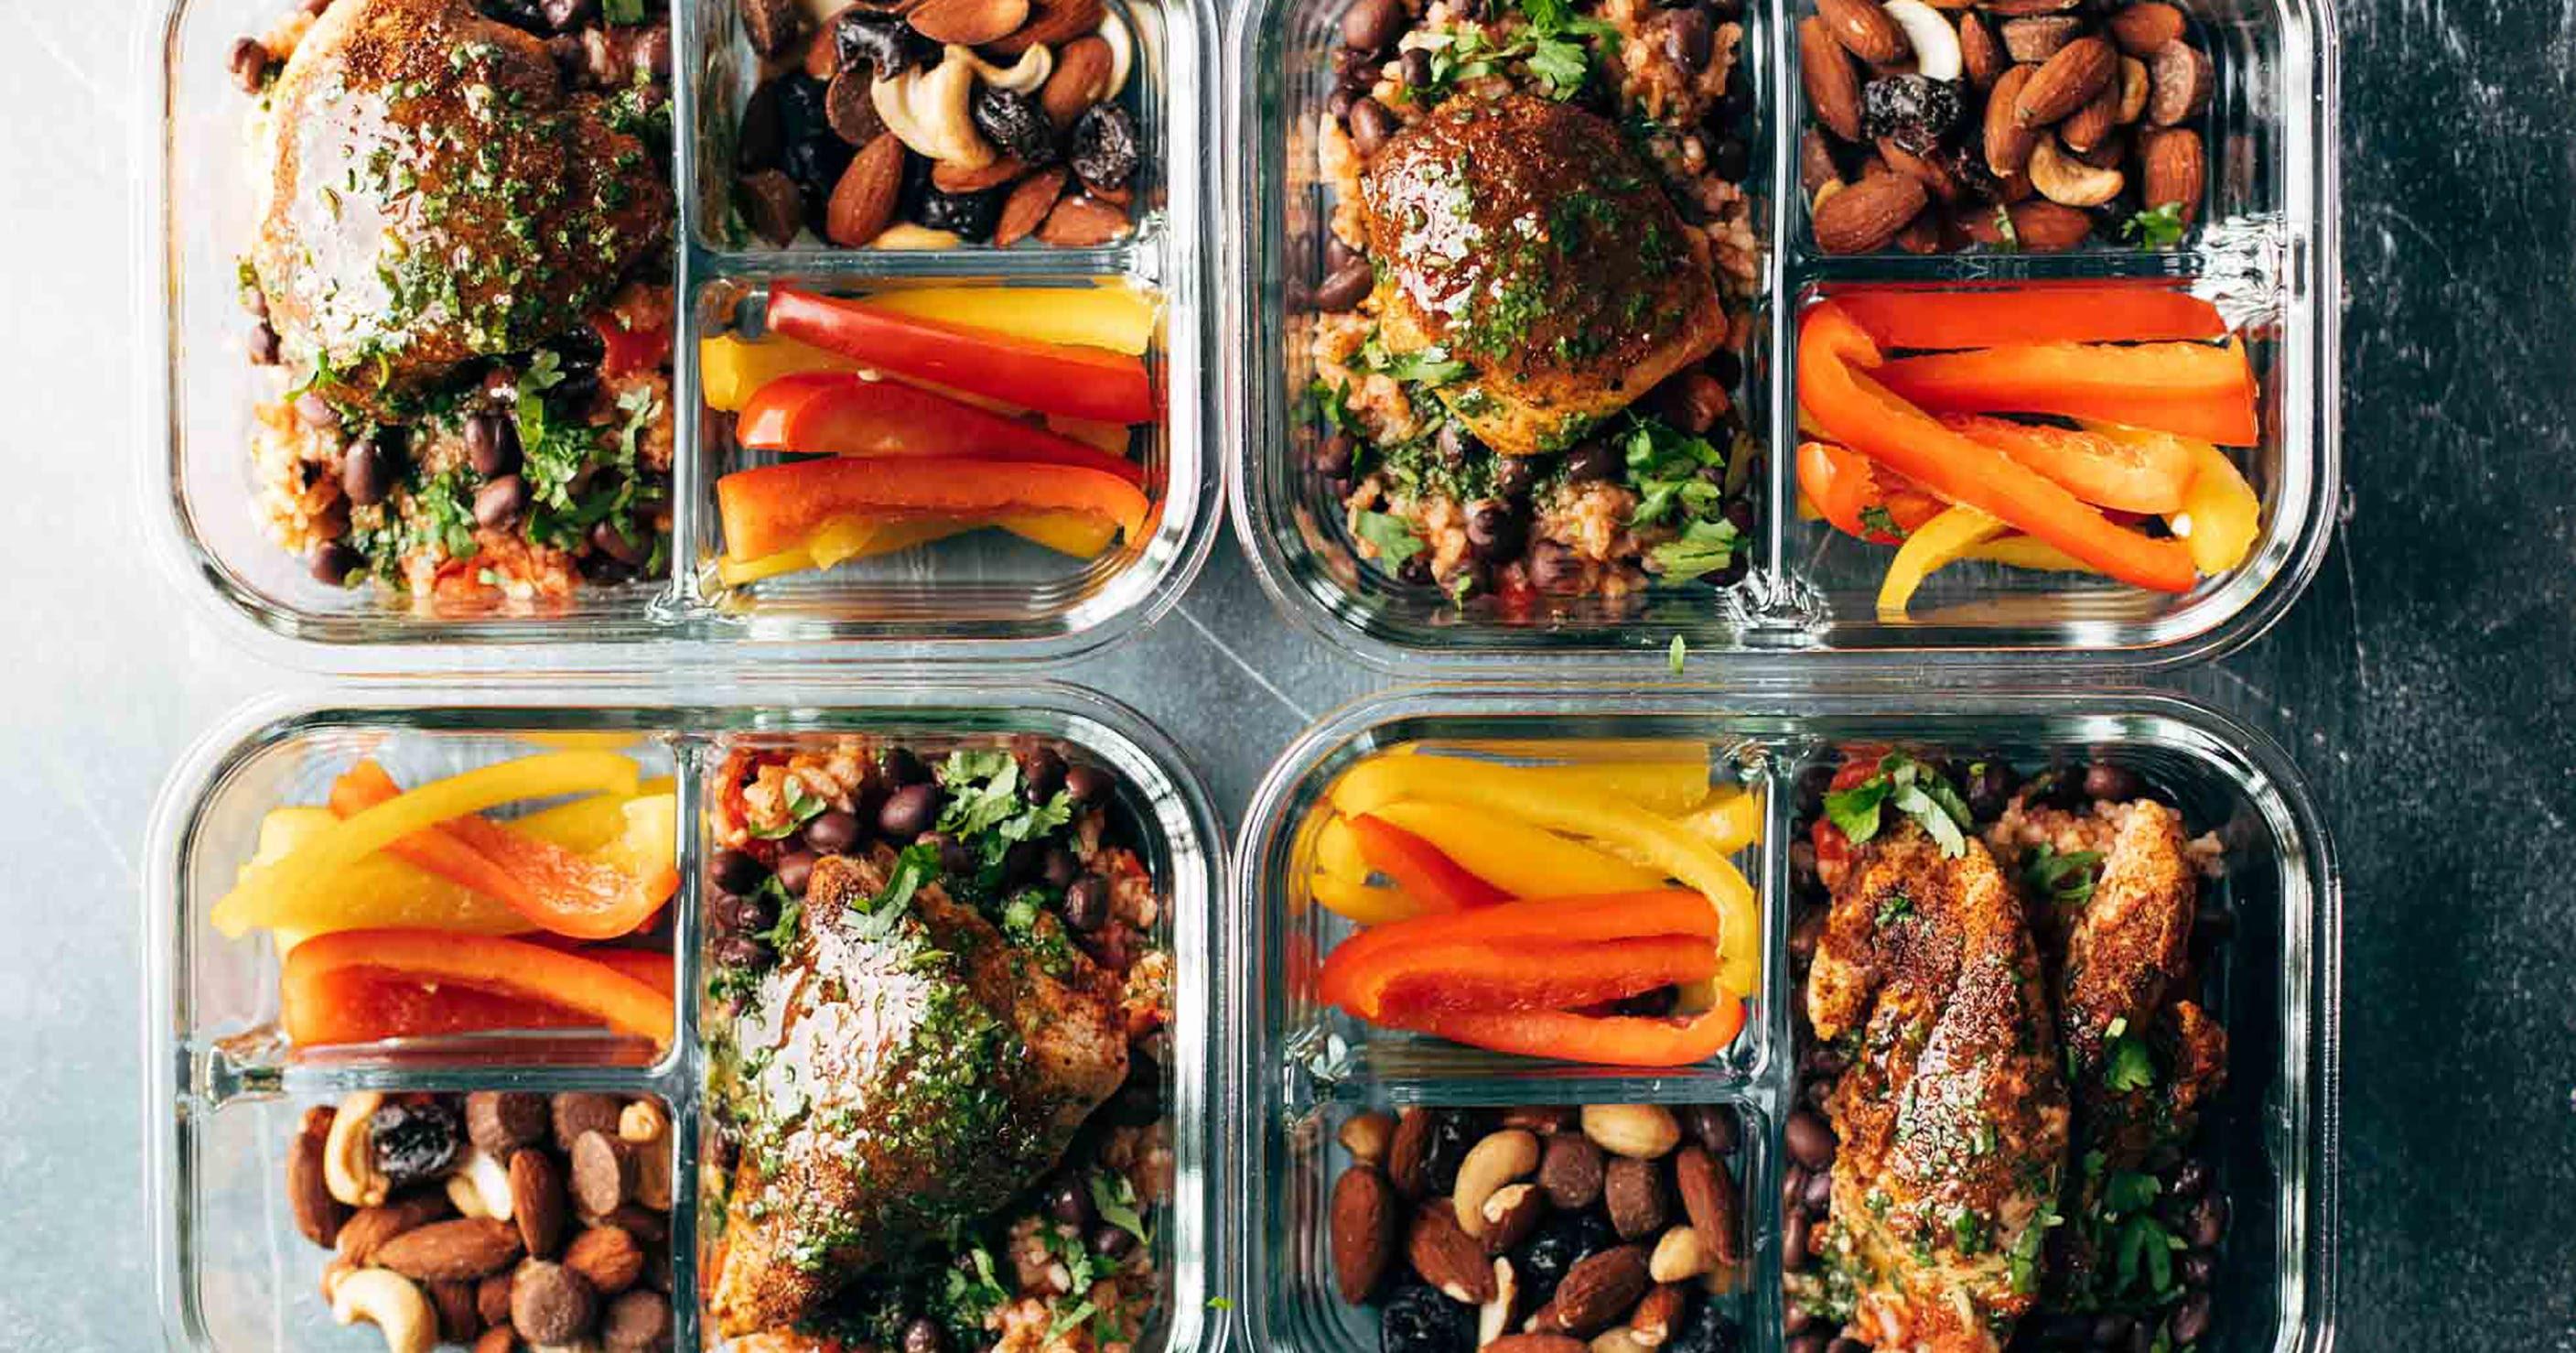 via0.com - January Healthy Meal Recipe Ideas